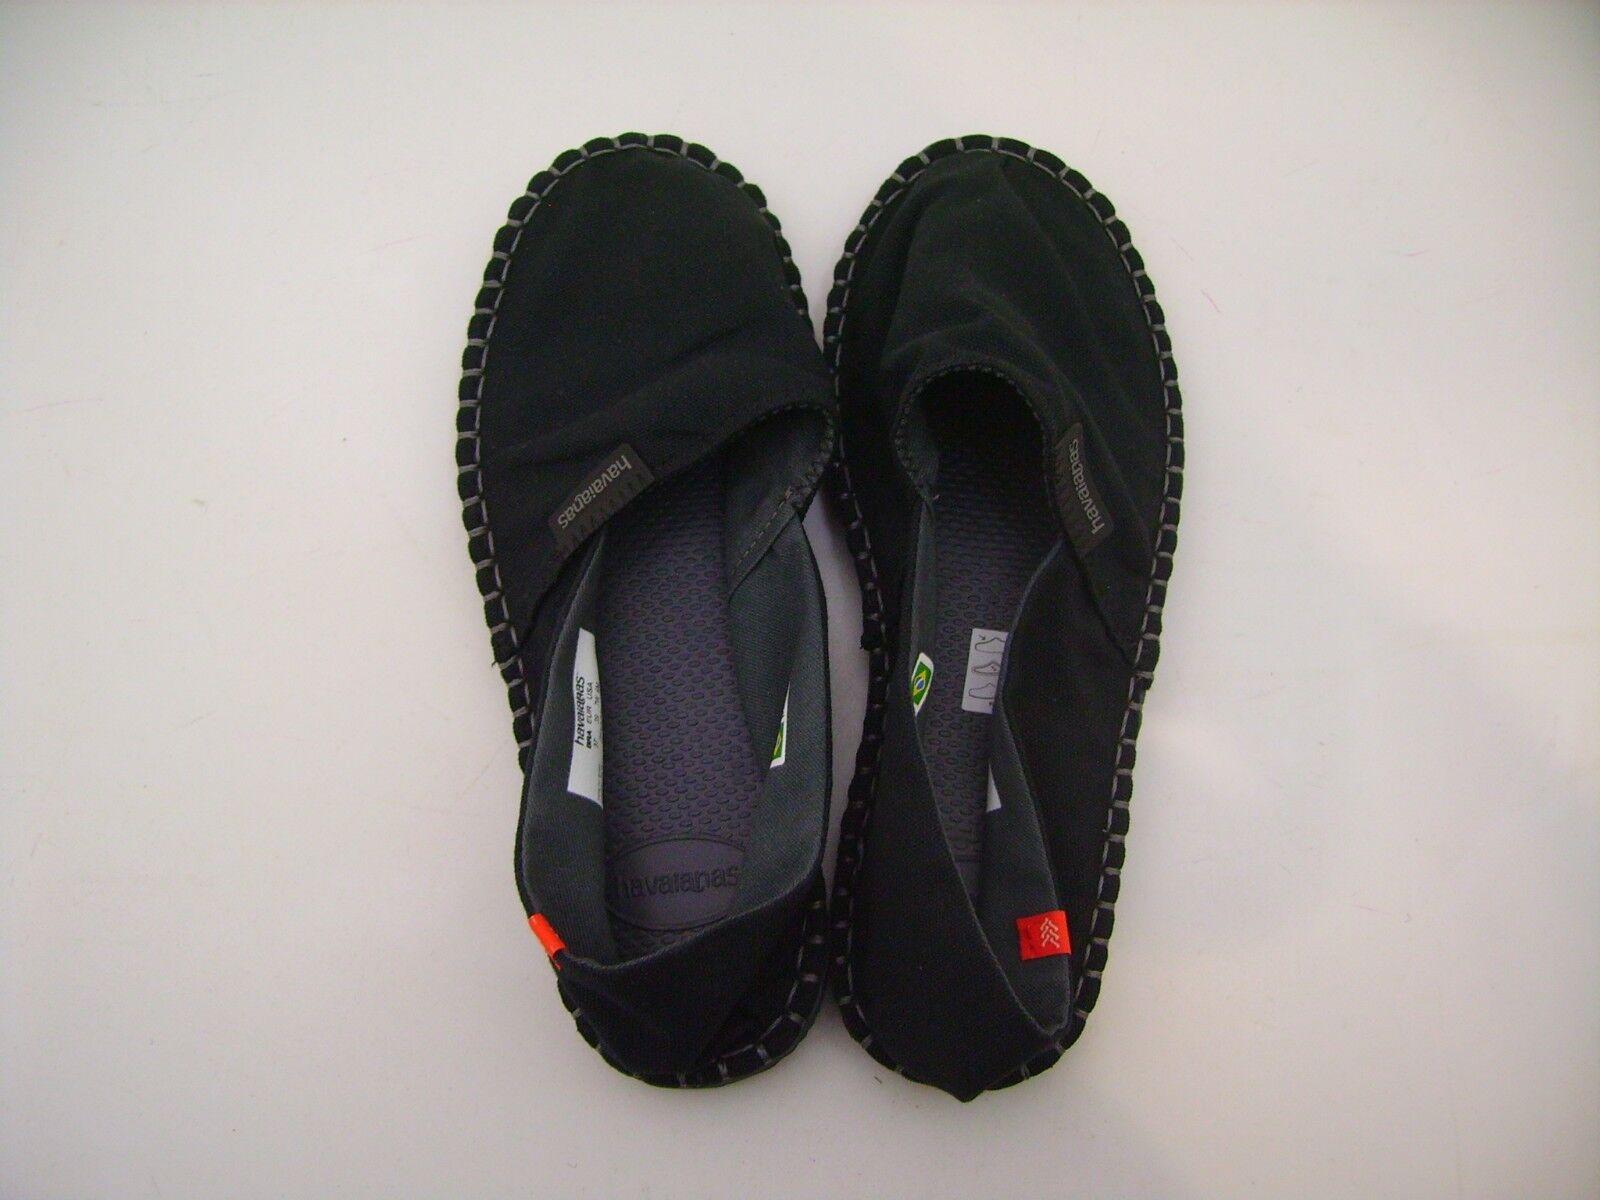 Havaianas shoes Cloth Man Woman Espadrilles Orig III Preto Black ita38